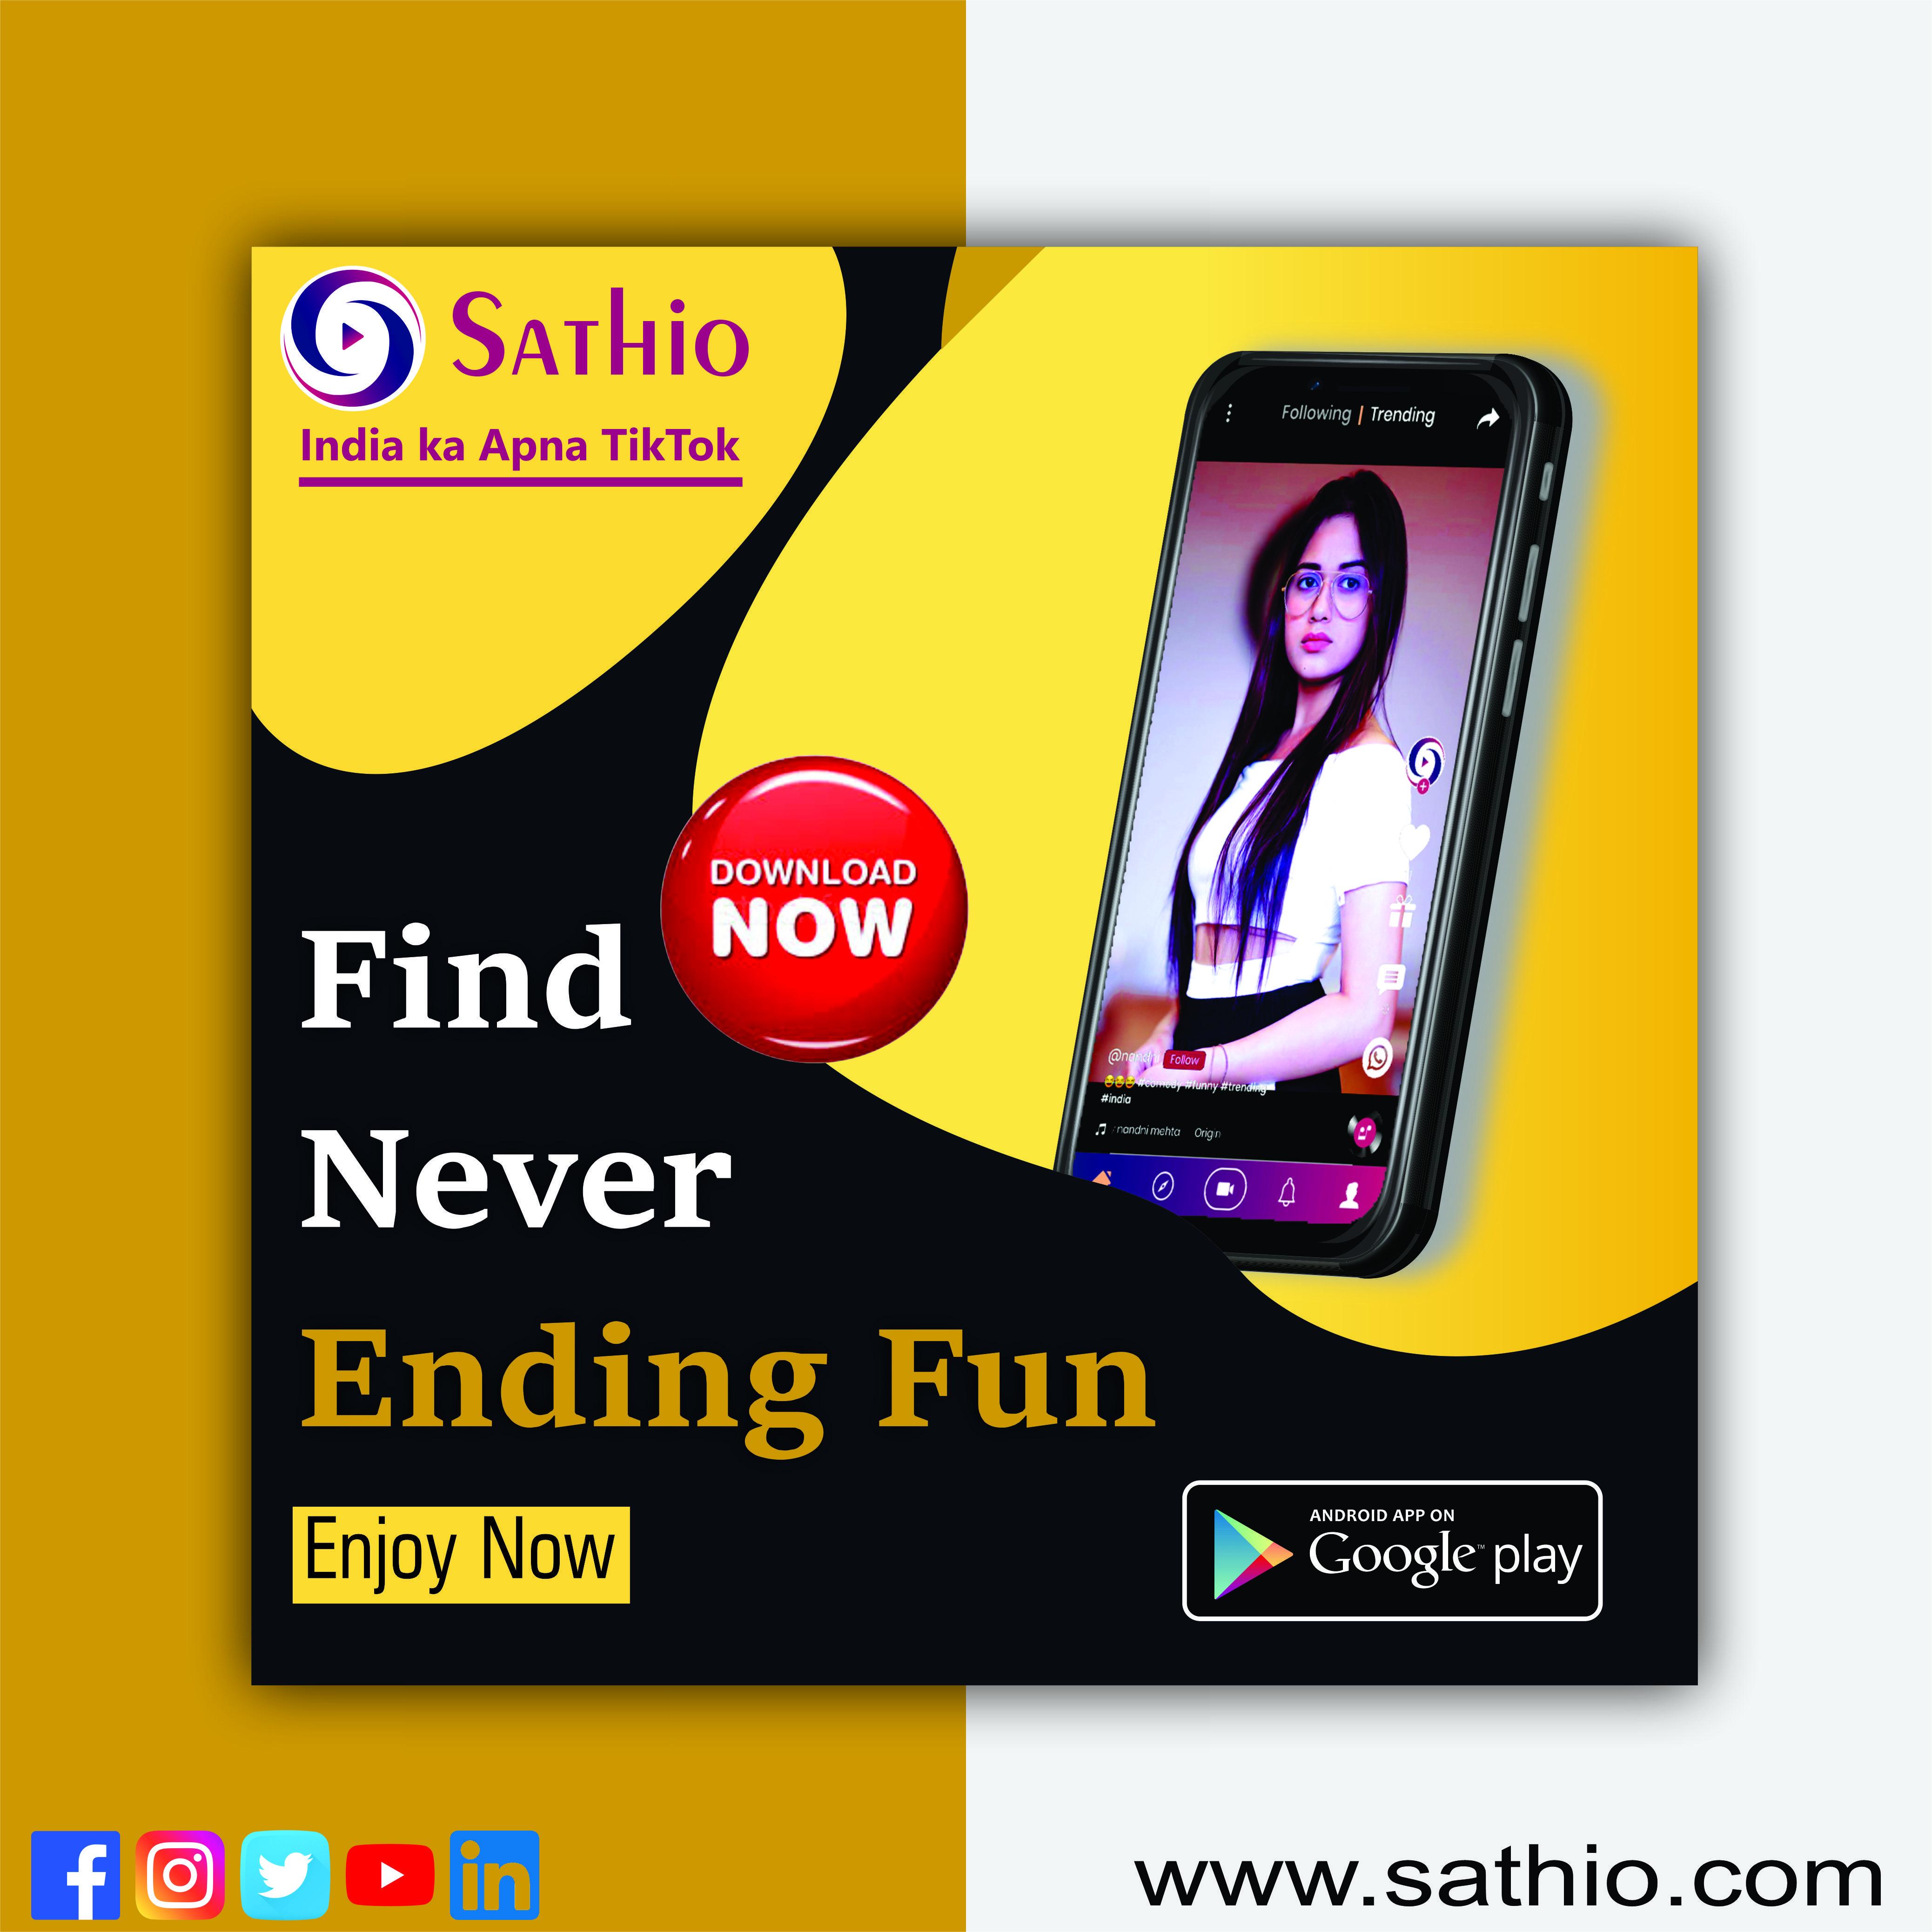 Sathio India Ka Tiktok Video App App Video